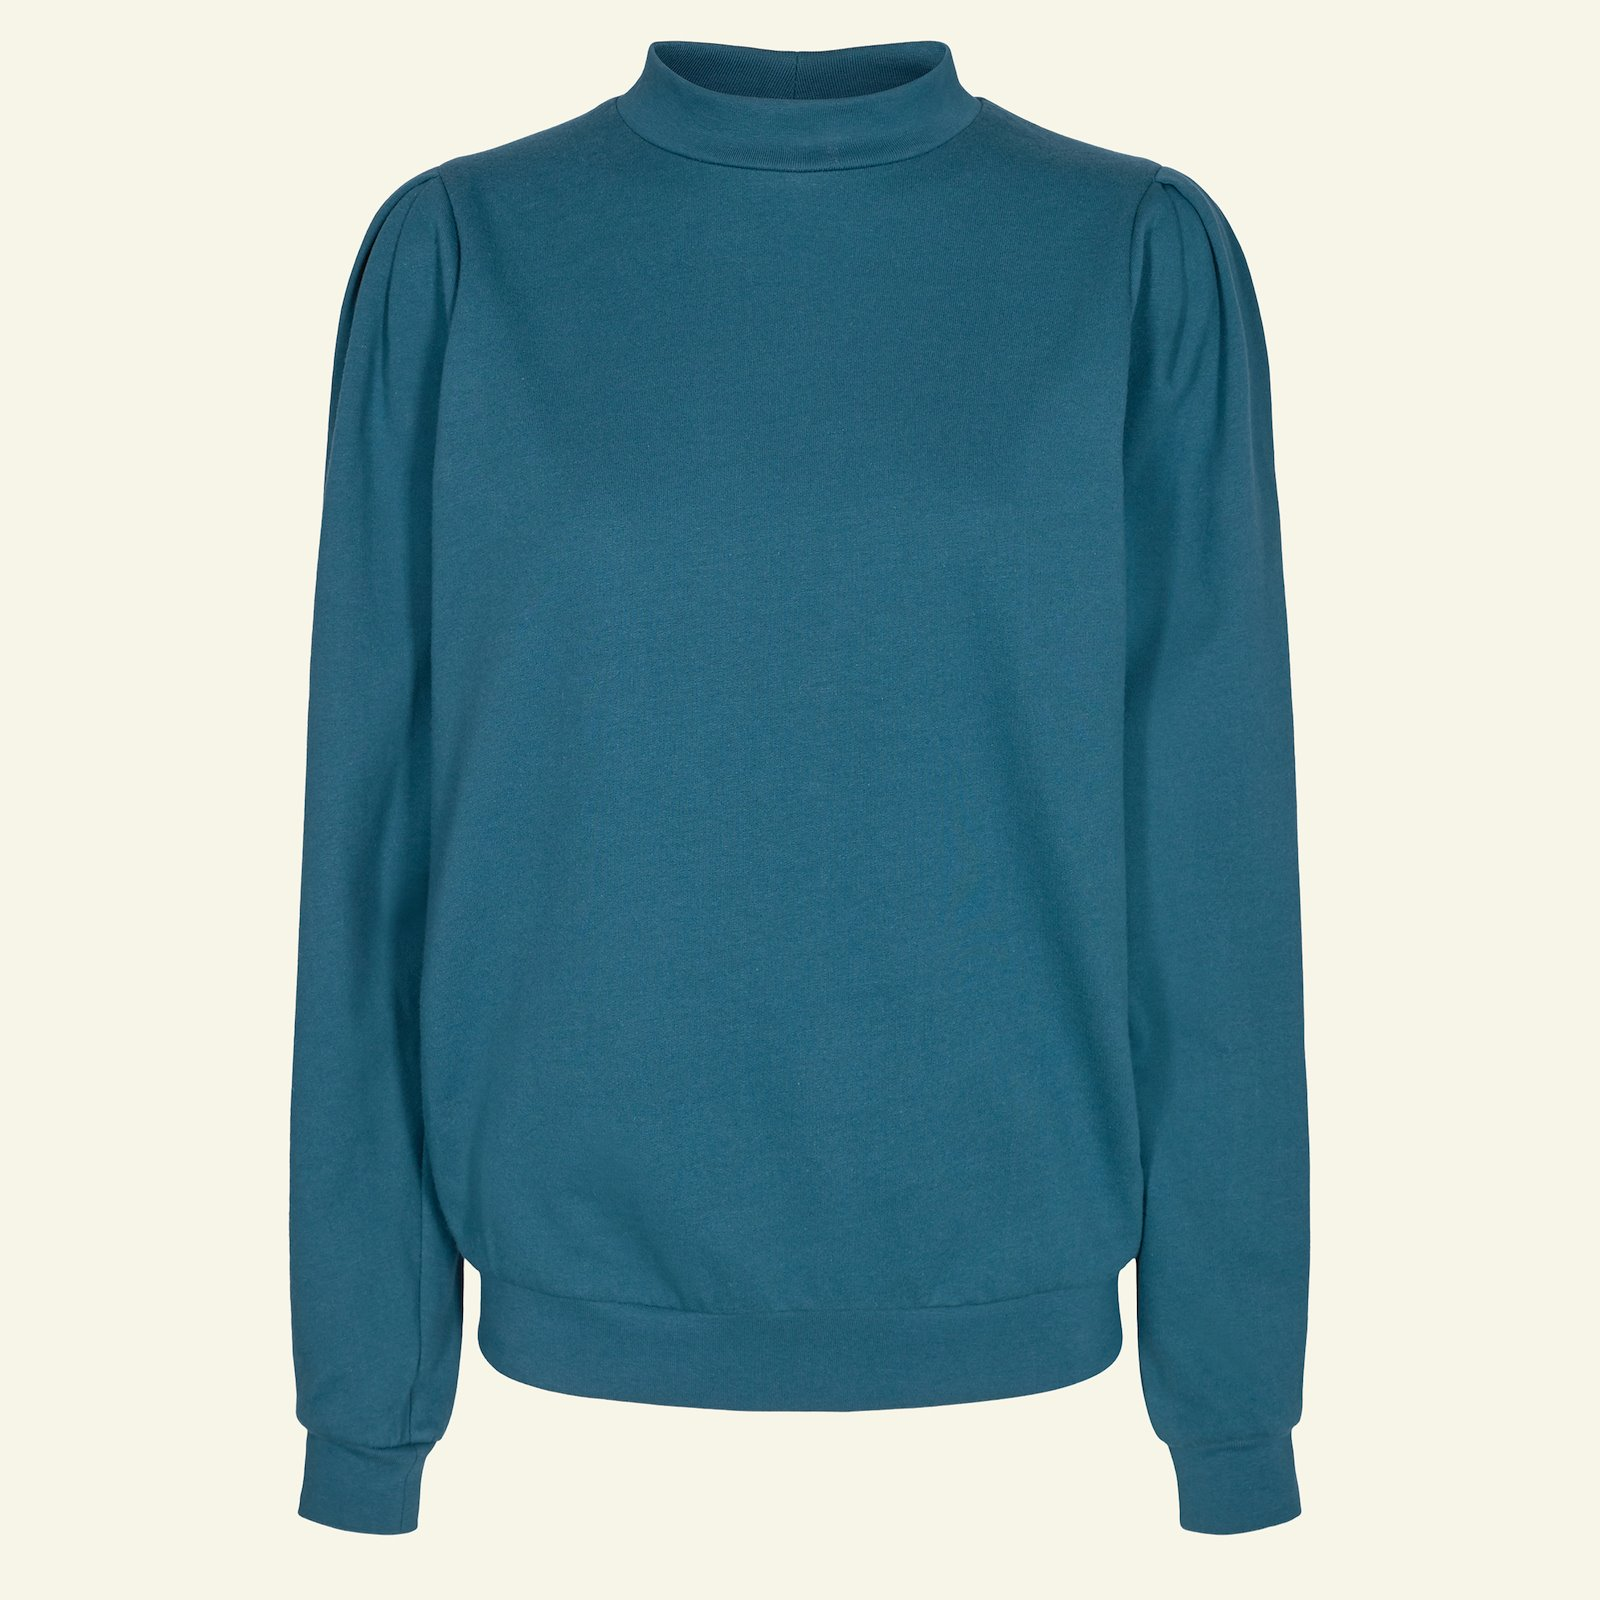 Sweatshirt with puff sleeves, S p22074_211775_230657_sskit